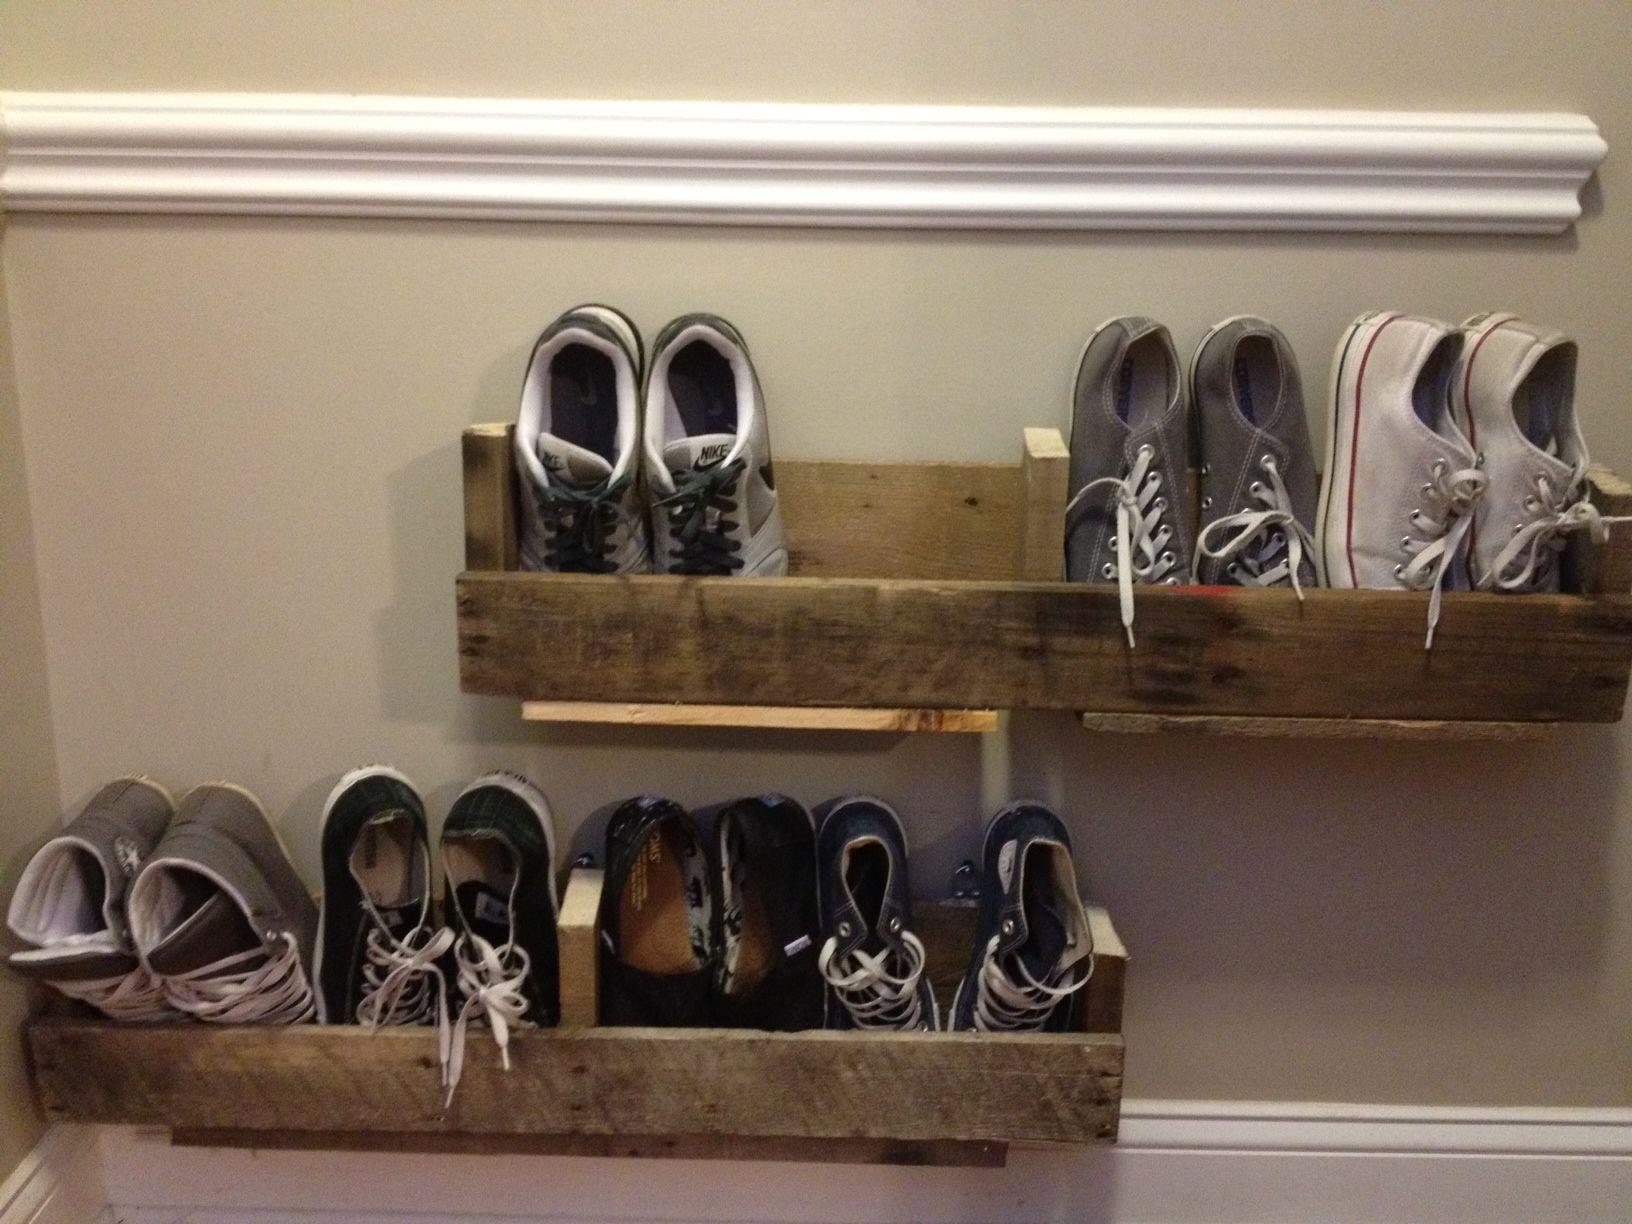 4 Steps to Make Beautiful Pallet Shoe Racks | Pallets Designs